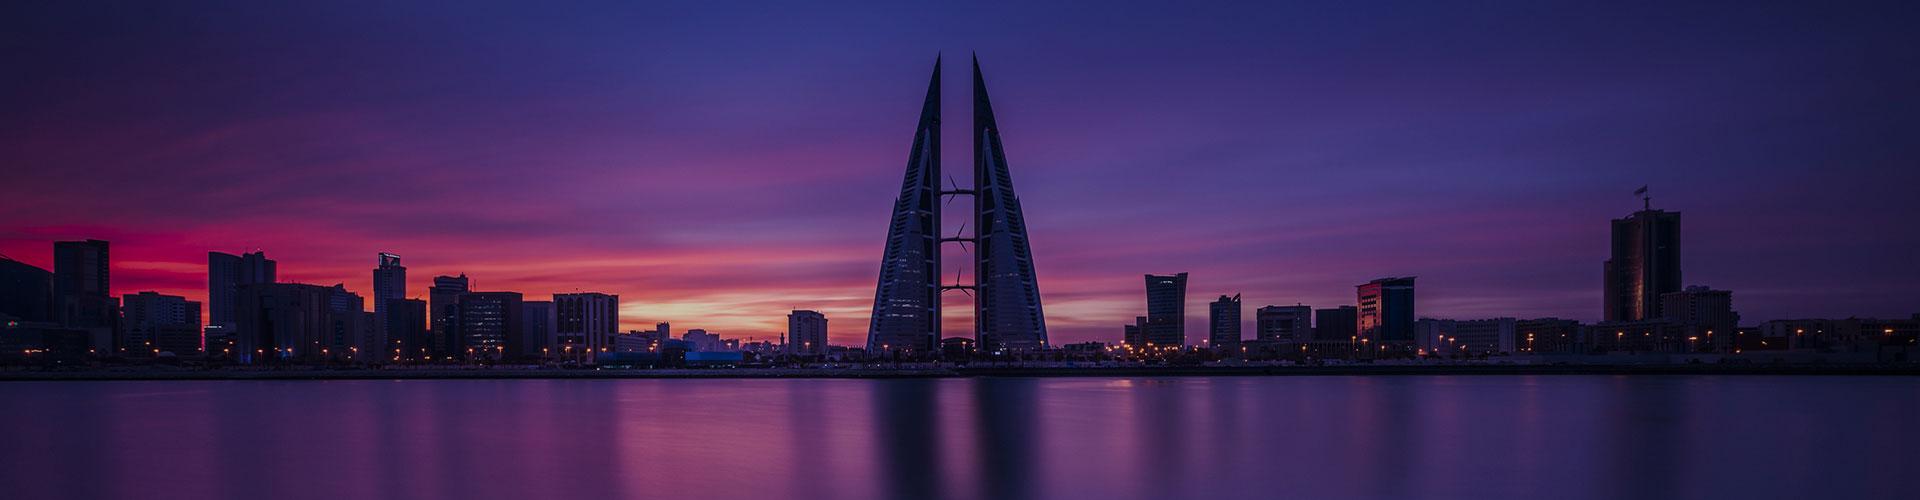 Landmark photograph of Bahrain